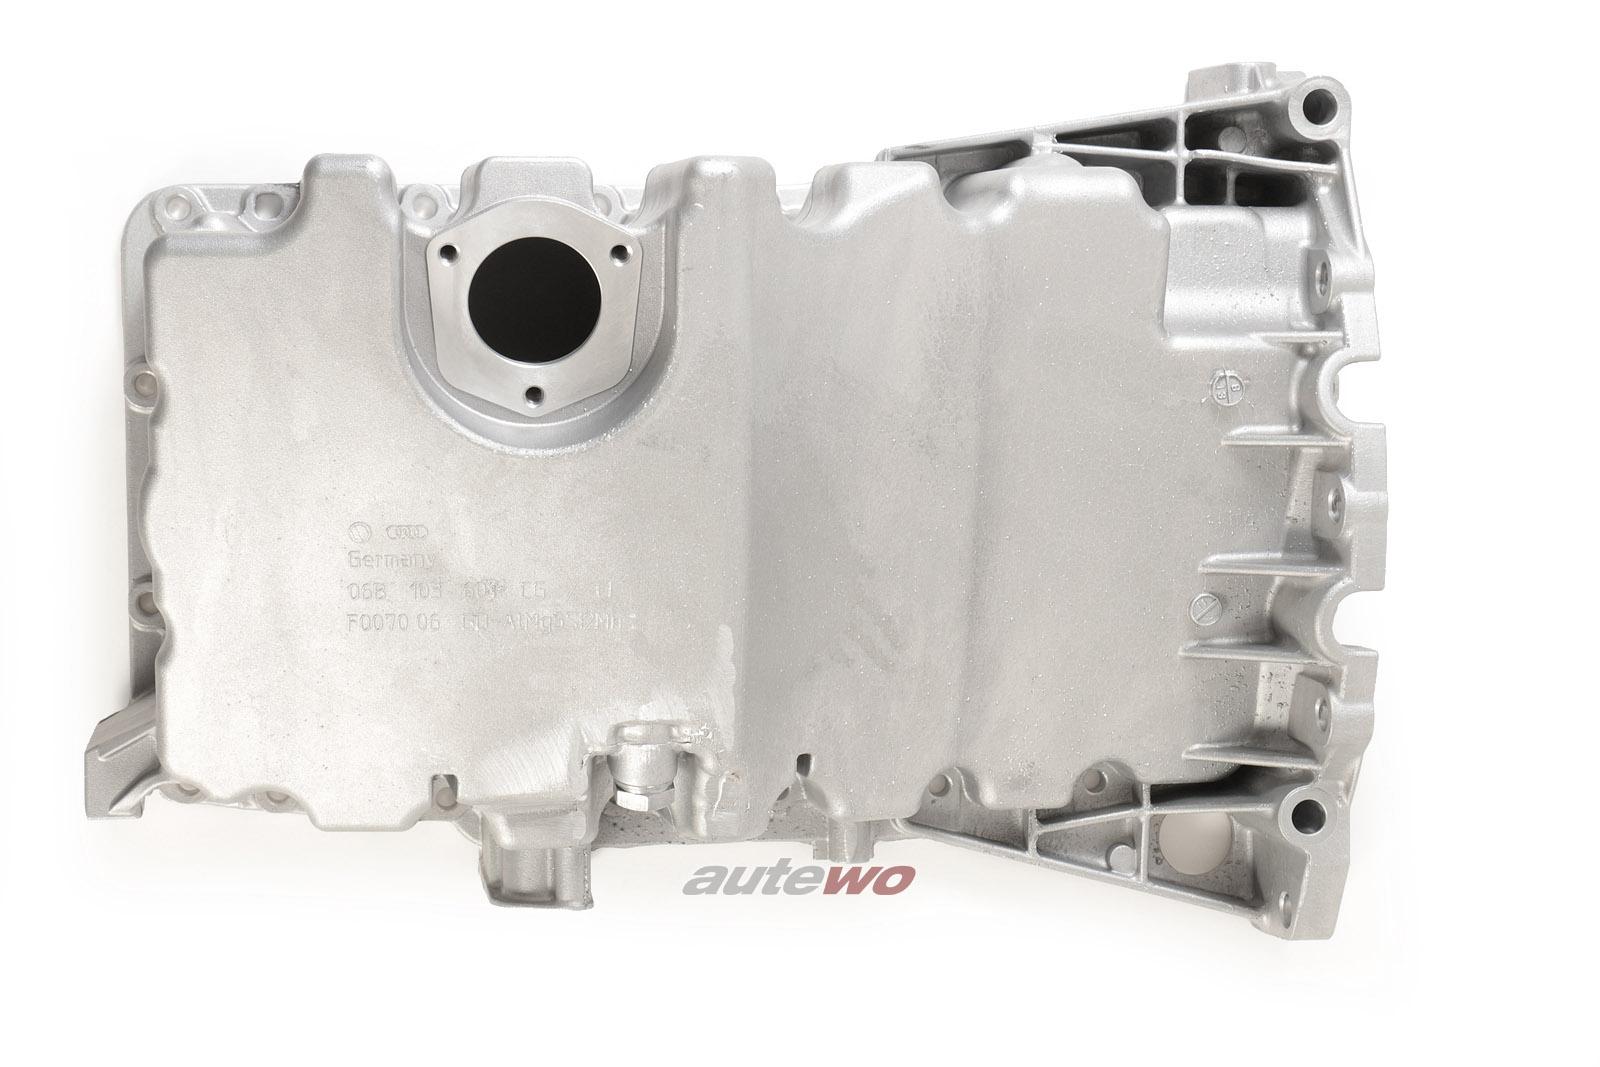 06D103598/06B103601CG NEU Audi A4 8E/B7/Cabrio 8H /A6 4F 2.0l TFSI Ölwanne